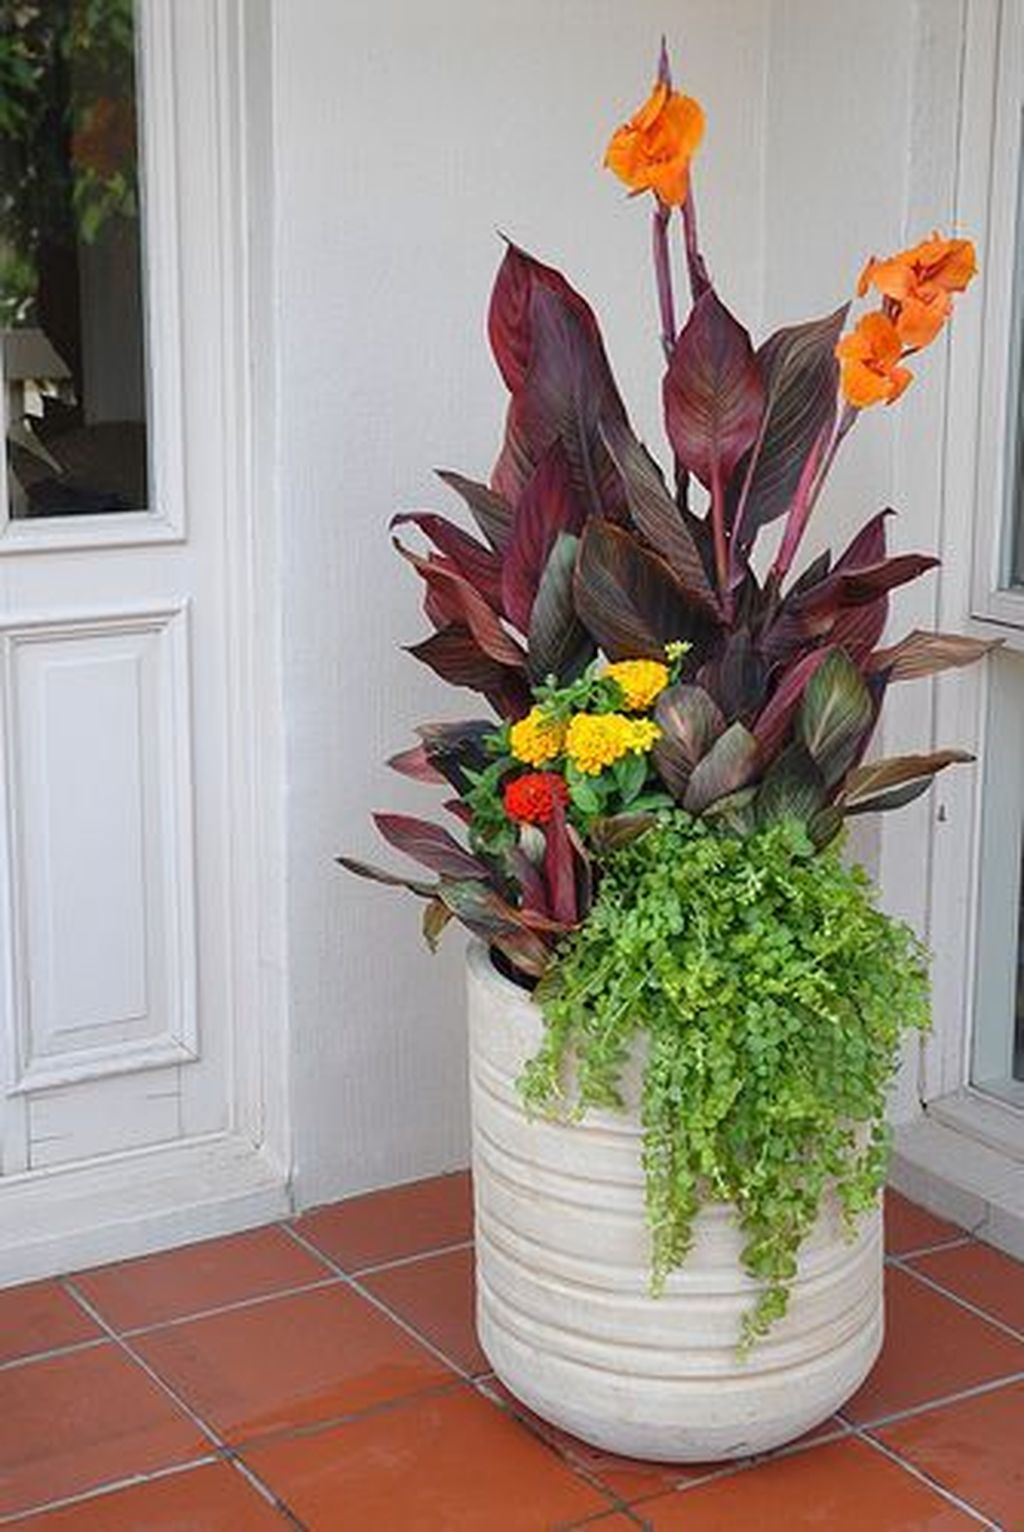 Inspiring Spring Planters Design Ideas For Front Door 24